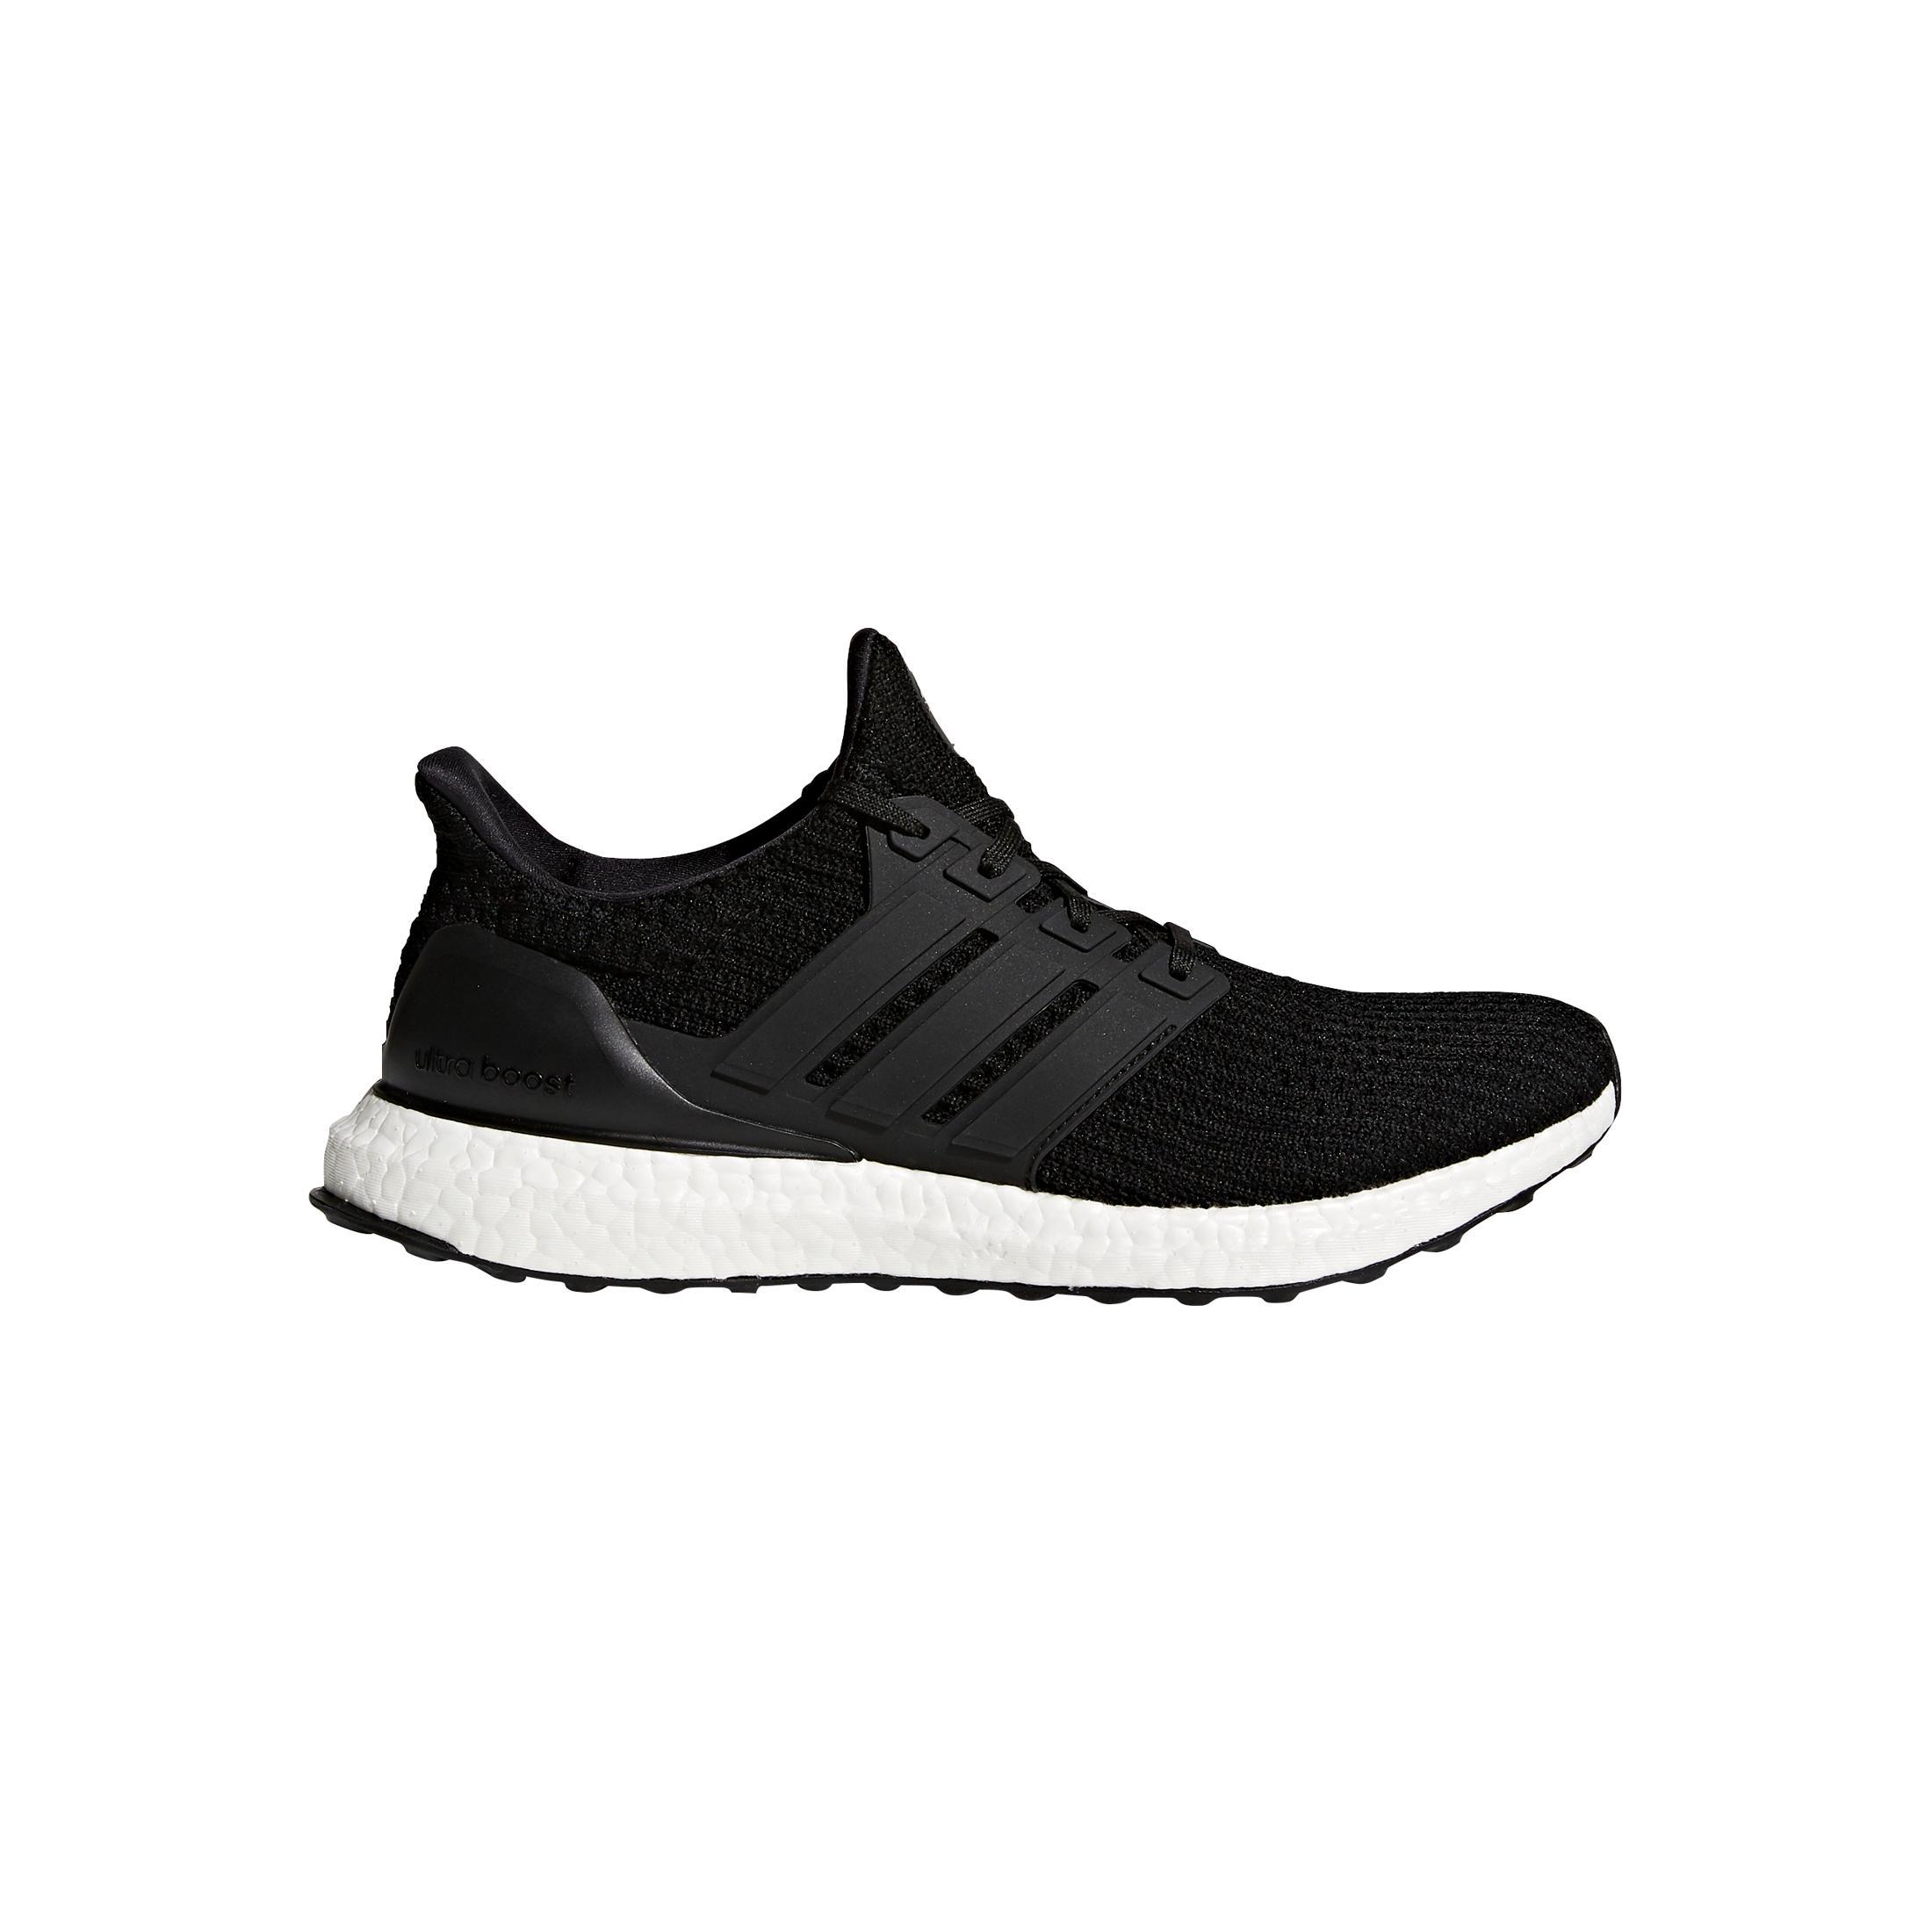 Adidas Boost Ultra Adidas Noir Boost Boost Noir Adidas Ultra Noir Ultra HommeLepape HommeLepape 3JKFlcT1